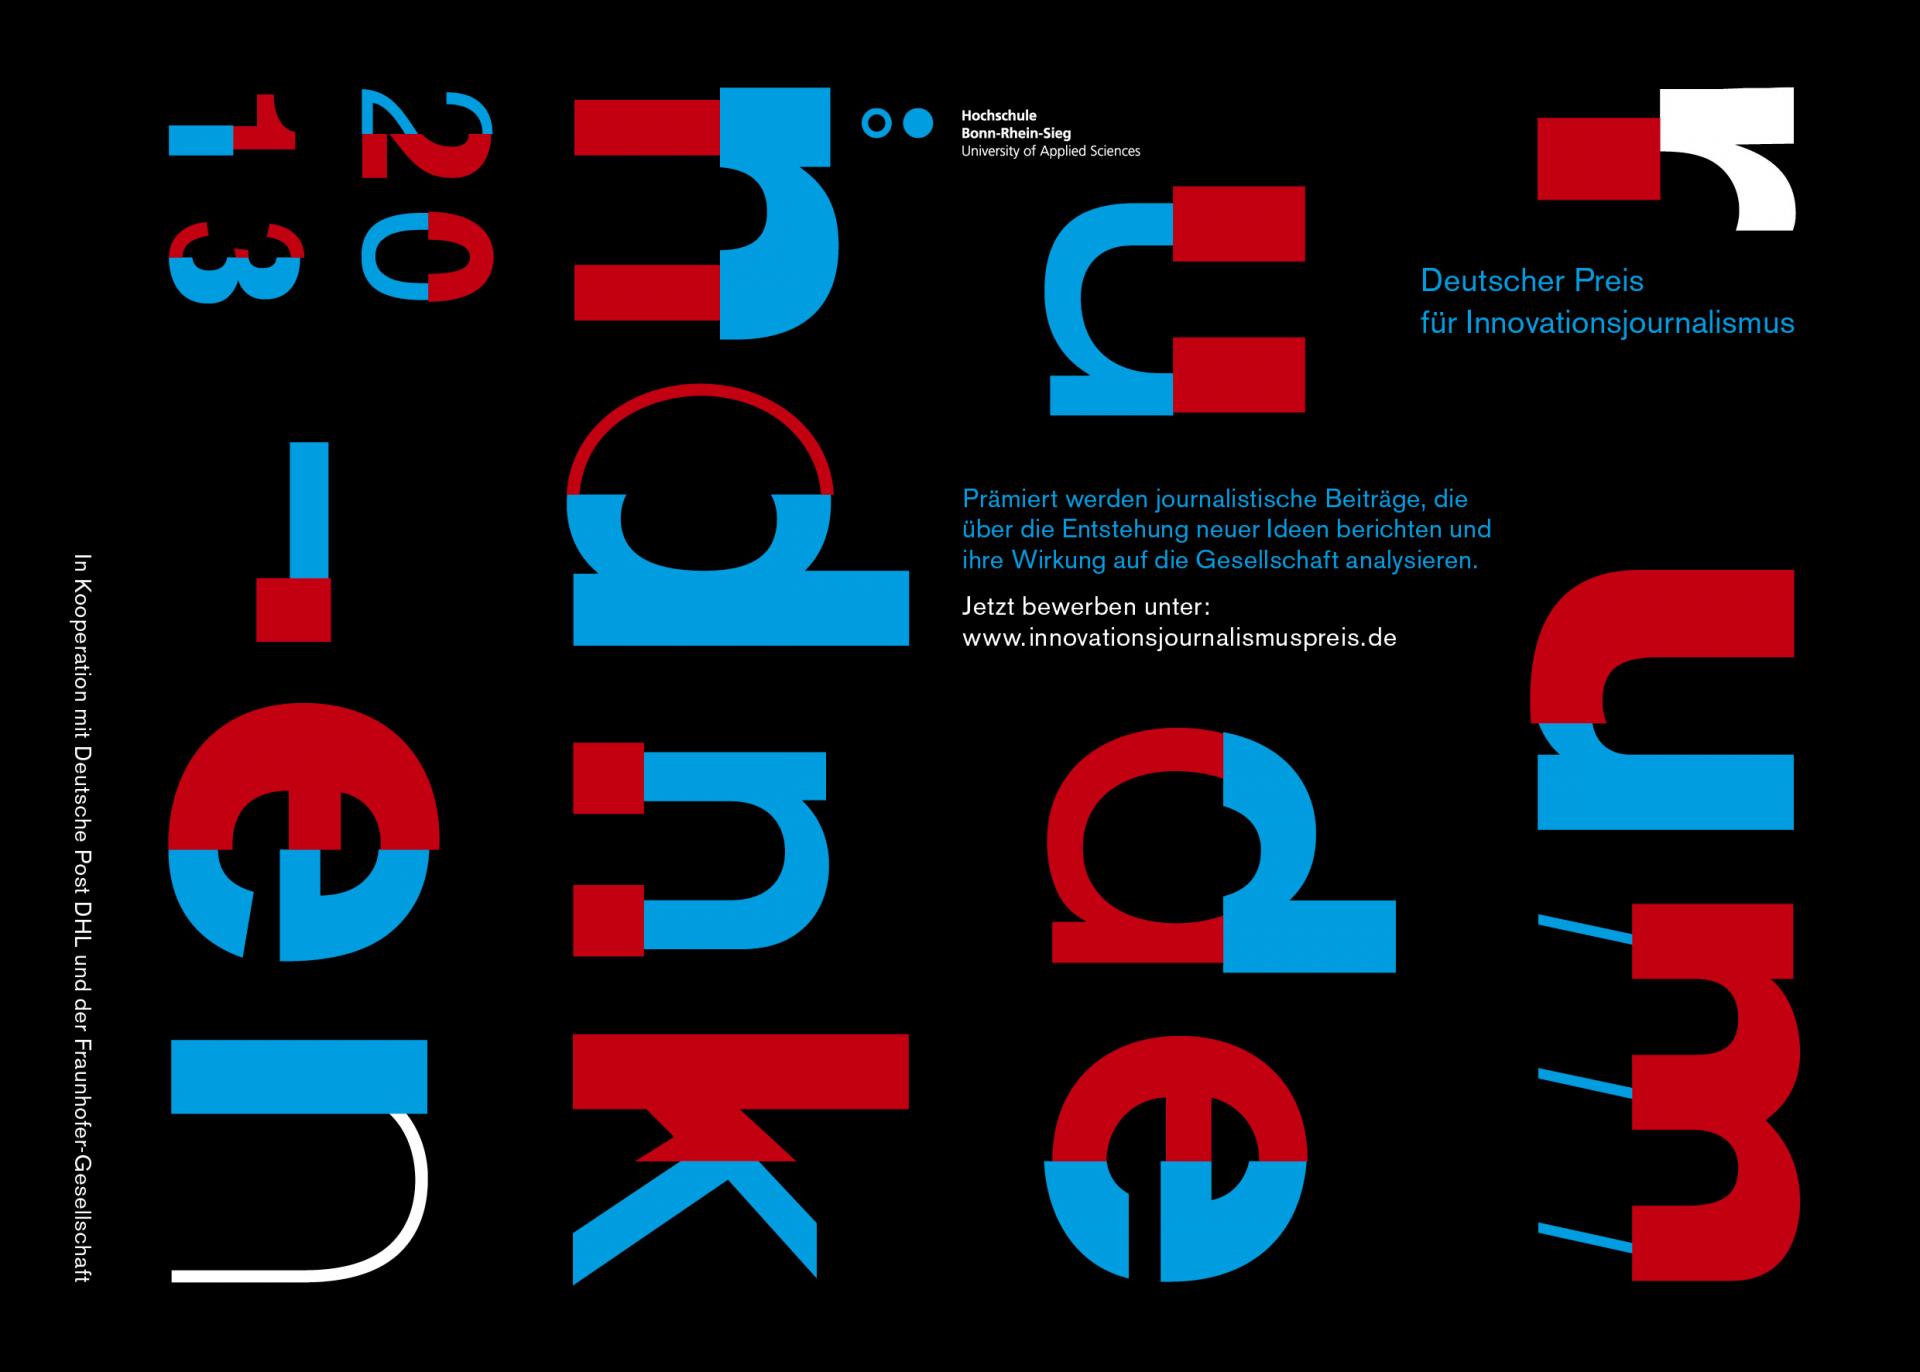 Designbüro Mittelsdorf rundumdenken → Corporate Design, Poster, Flyer, Website